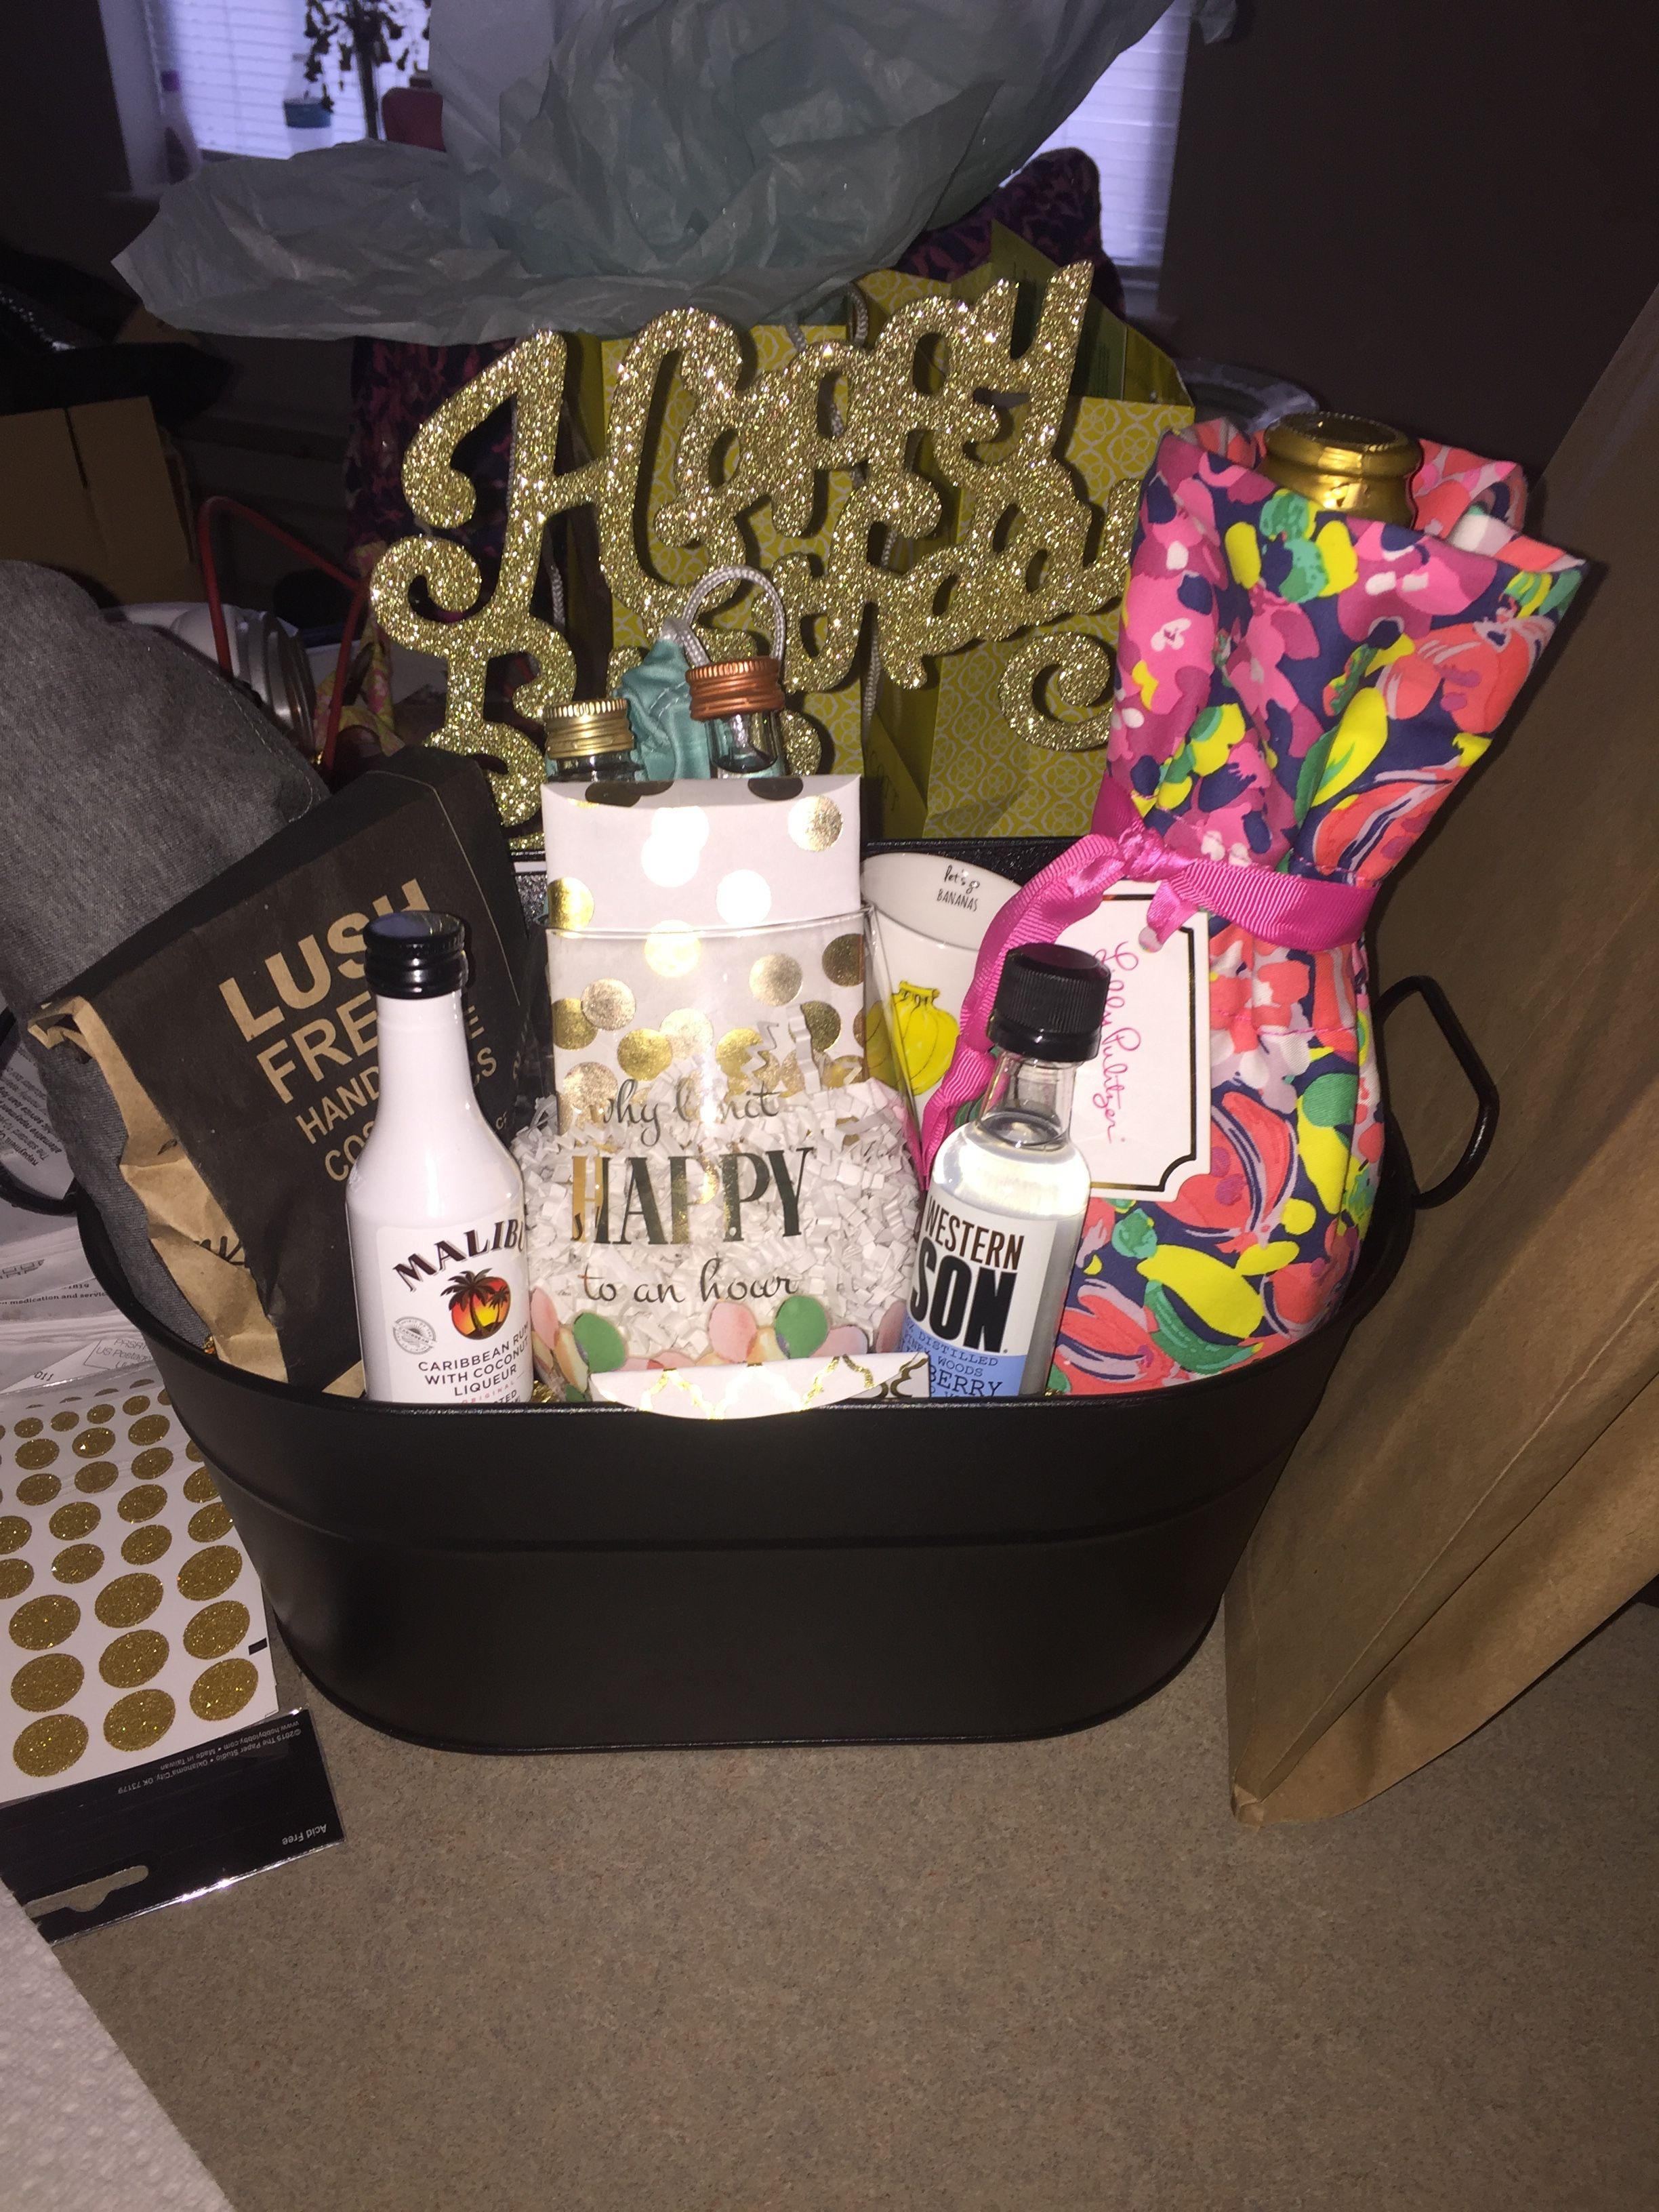 21 FUN. 21st Birthday Gift. Gift for her. BFF Gift. DIY